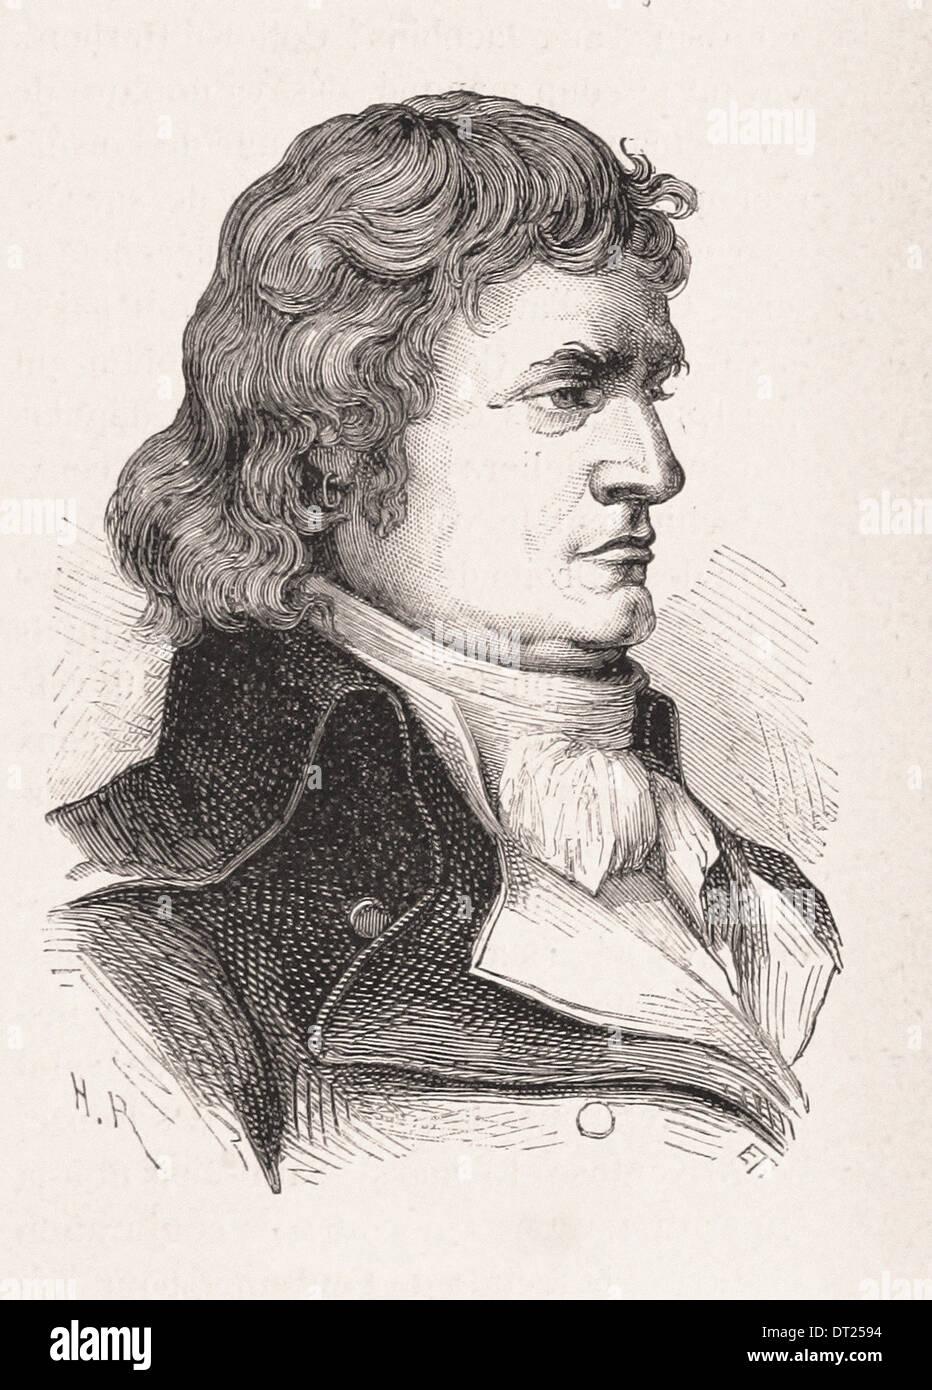 Portrait of Jean-Bon-Saint-André - French engraving XIX th century - Stock Image